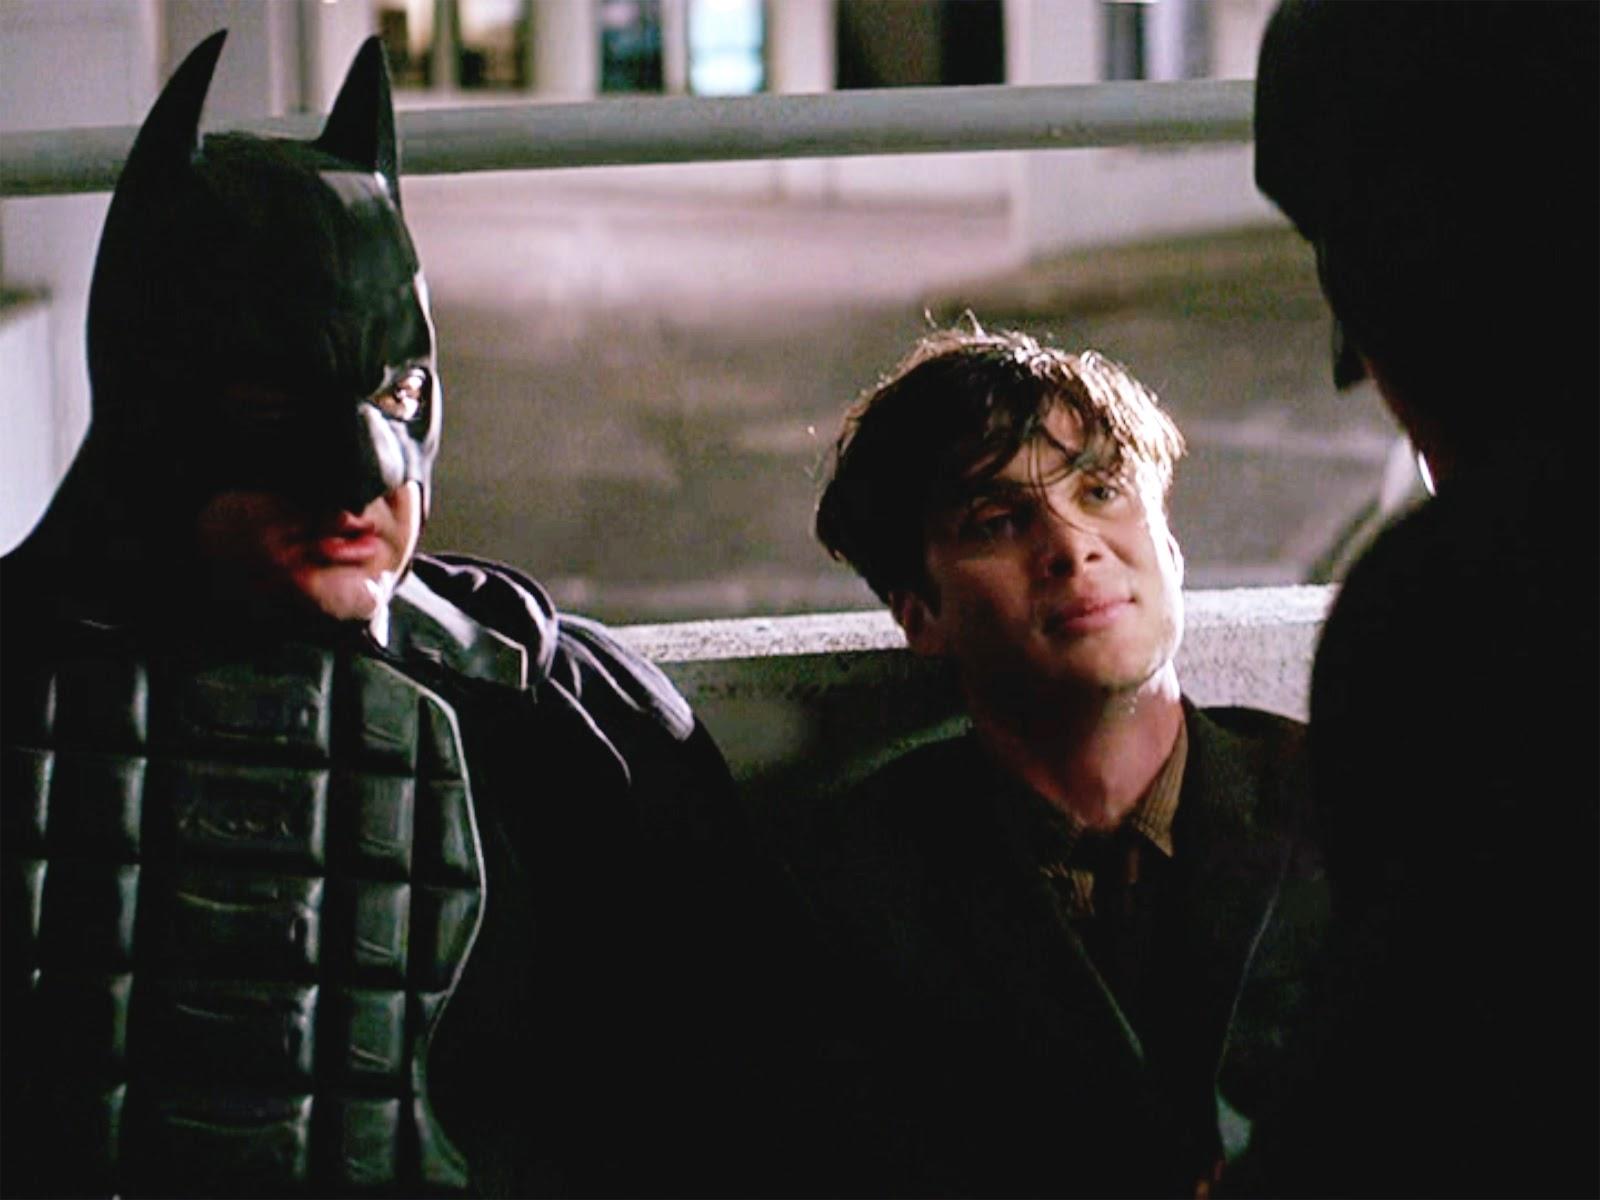 Batman-impersonator